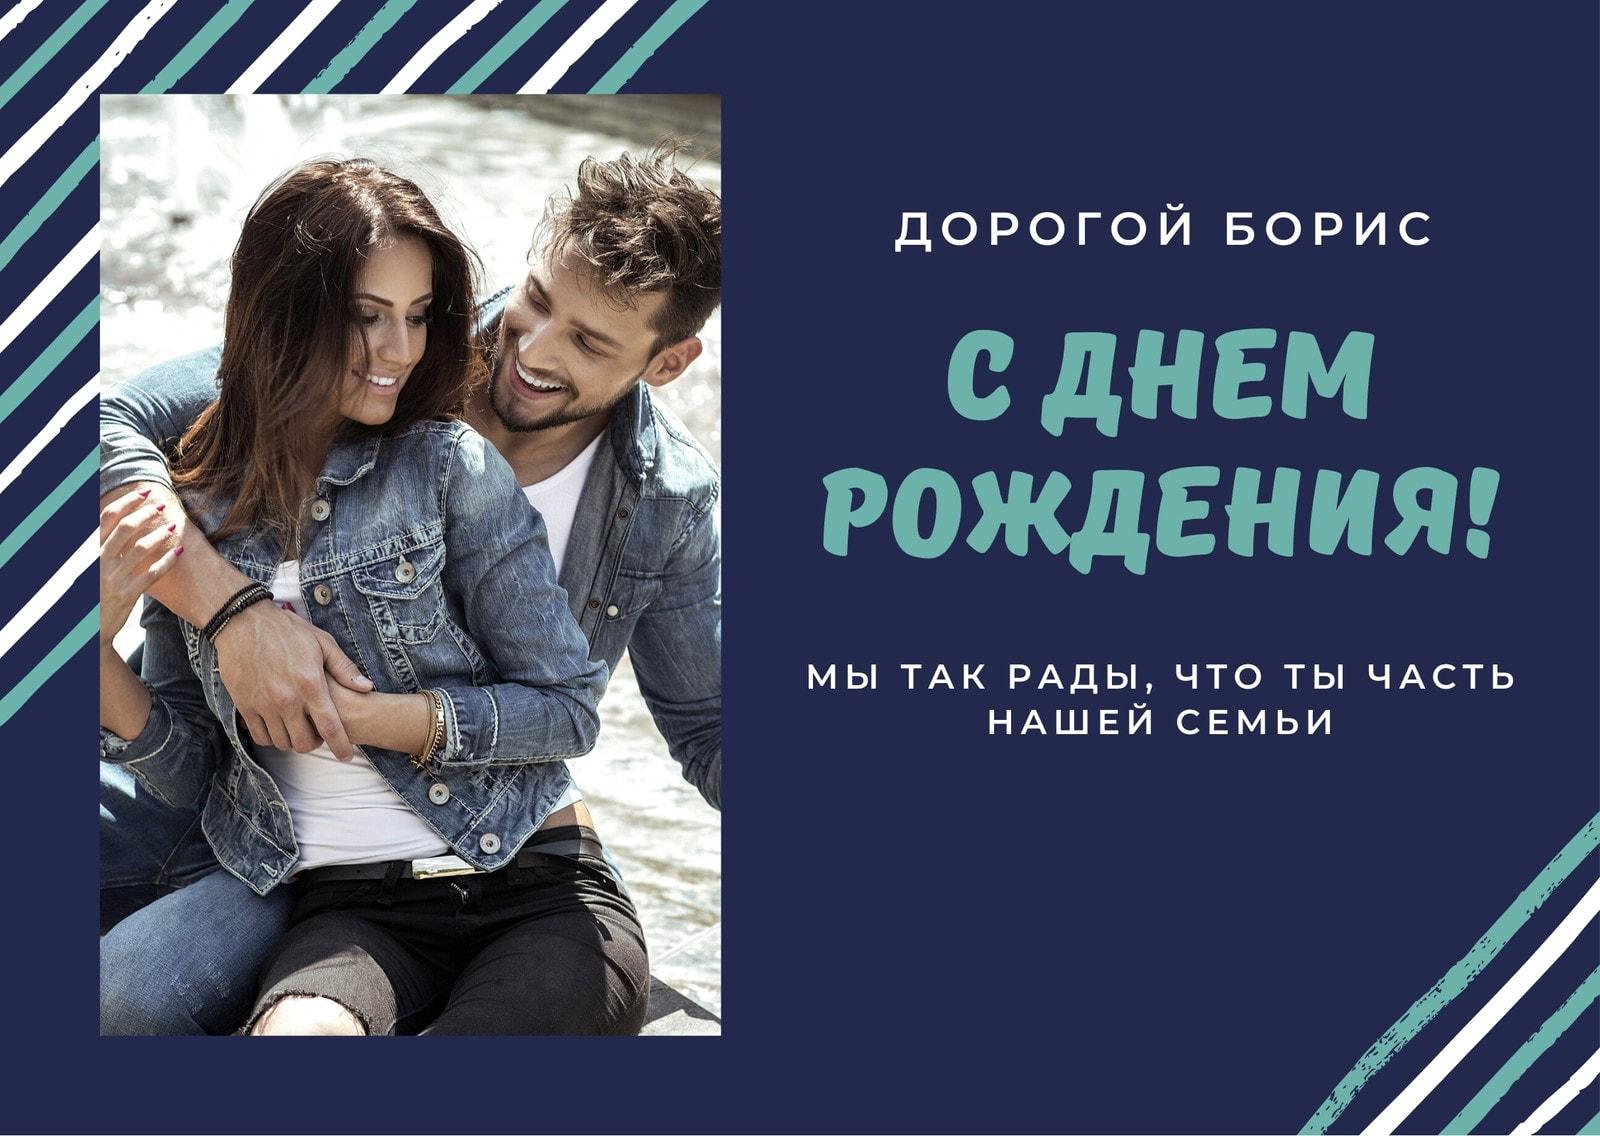 Темно-Синяя Полоски Мазки кисти Шурин День рождения Открытка